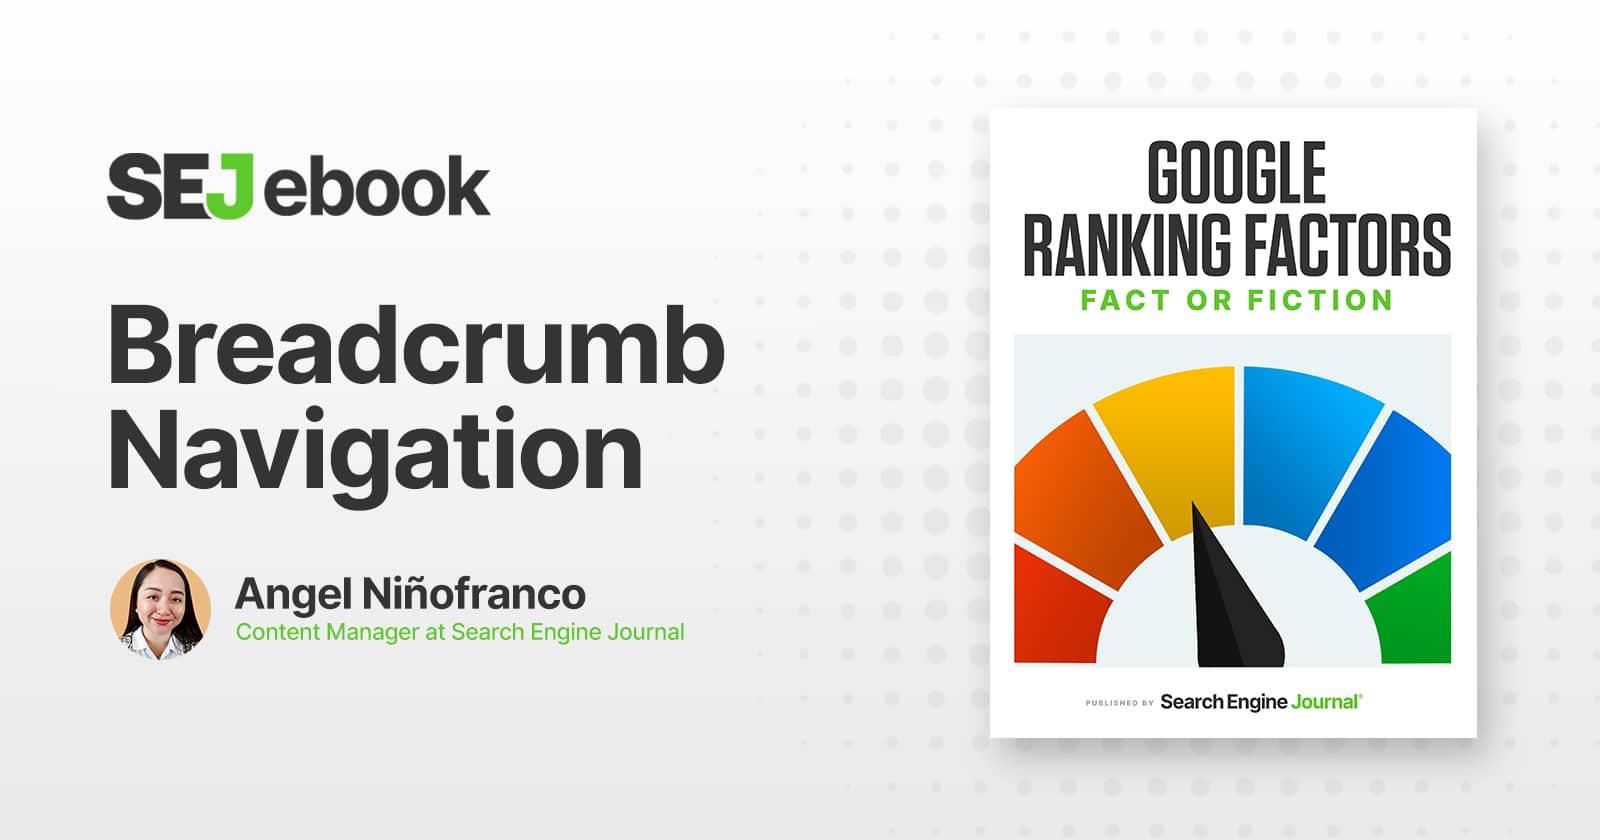 Breadcrumb Navigation: Is It a Google Ranking Factor? via @sejournal, @A_Ninofranco